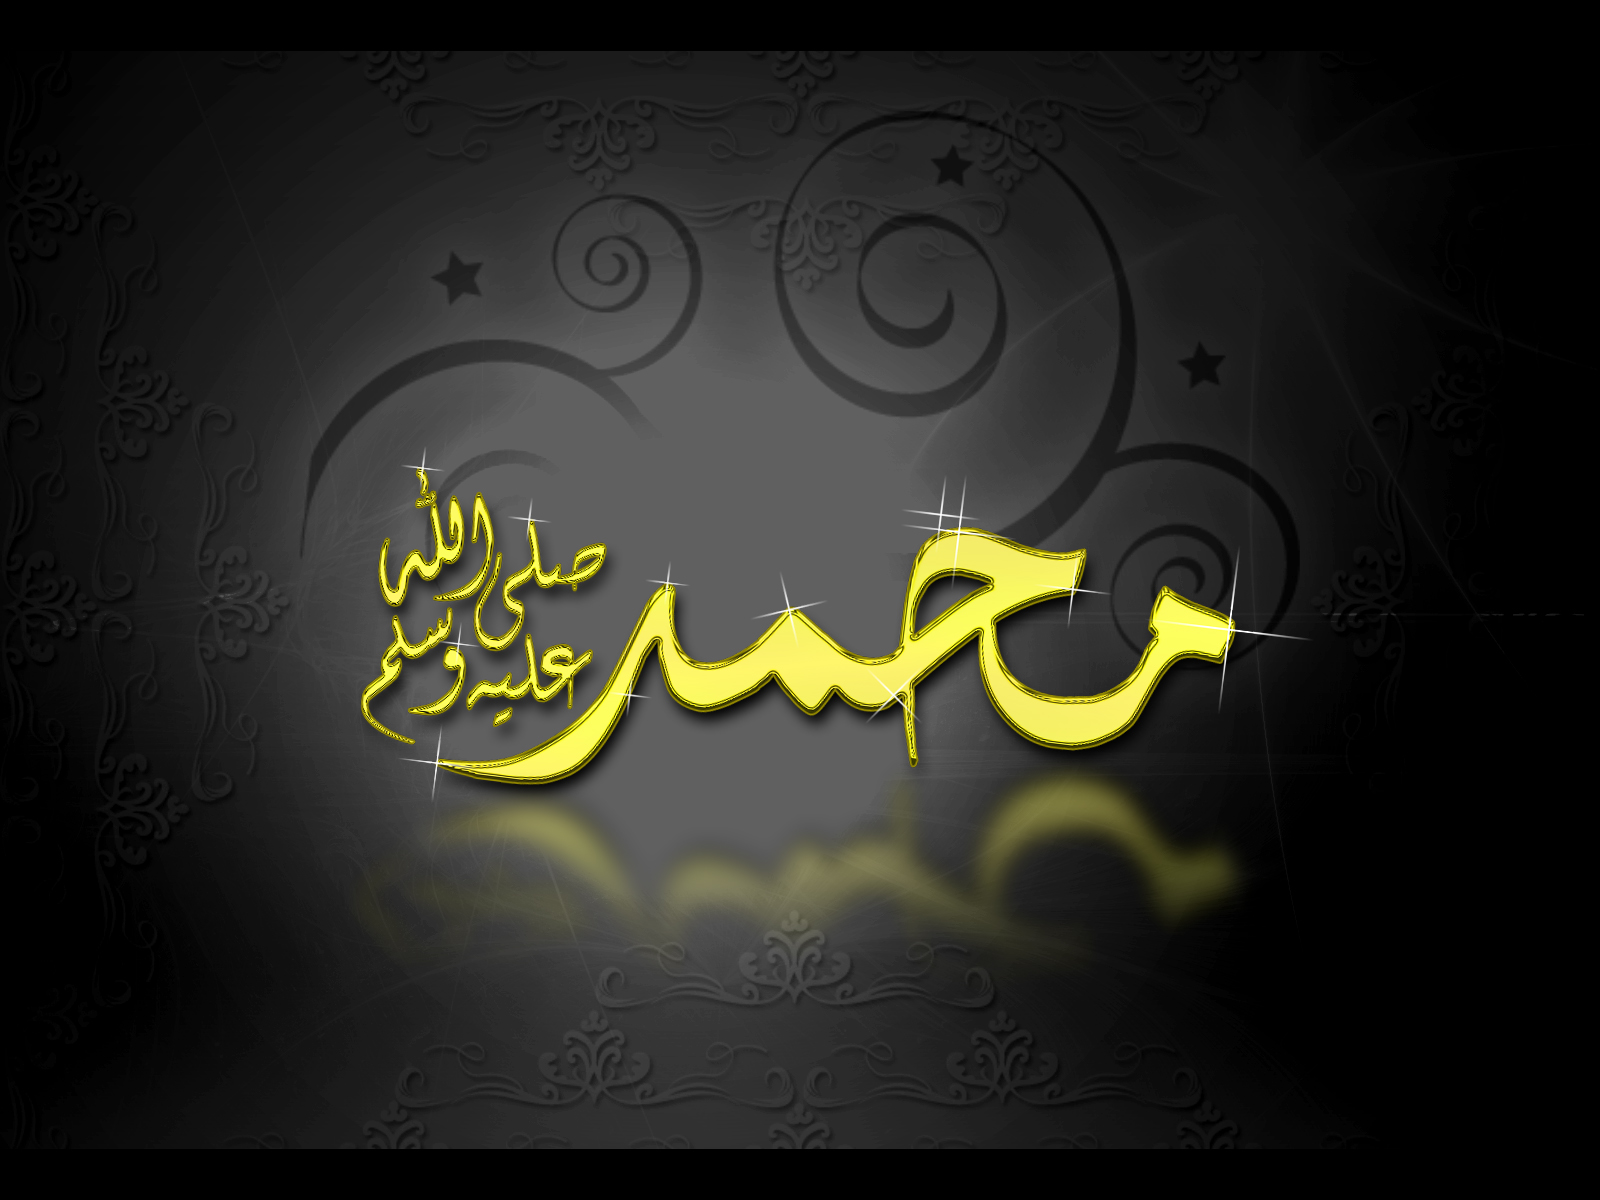 http://2.bp.blogspot.com/-UdCBlPHESTA/T2BkQ1GPhHI/AAAAAAAAAoo/XmROk4ocPNg/s1600/Wallpaper+Muhammad+Rasulullah+%252823%2529.jpg